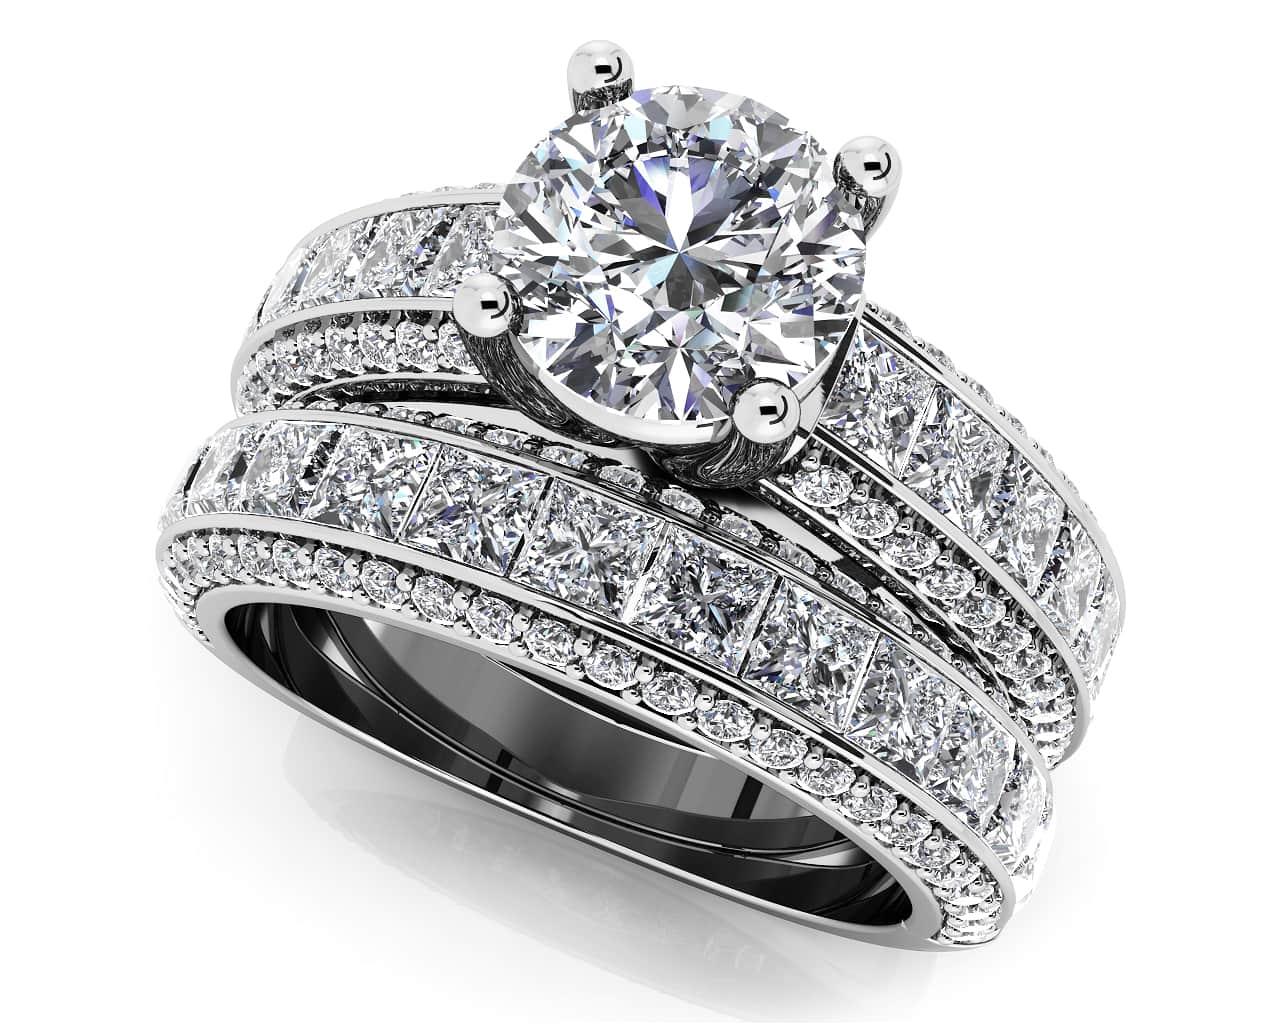 customize your wedding set matching diamond bridal set - Diamond Wedding Ring Sets